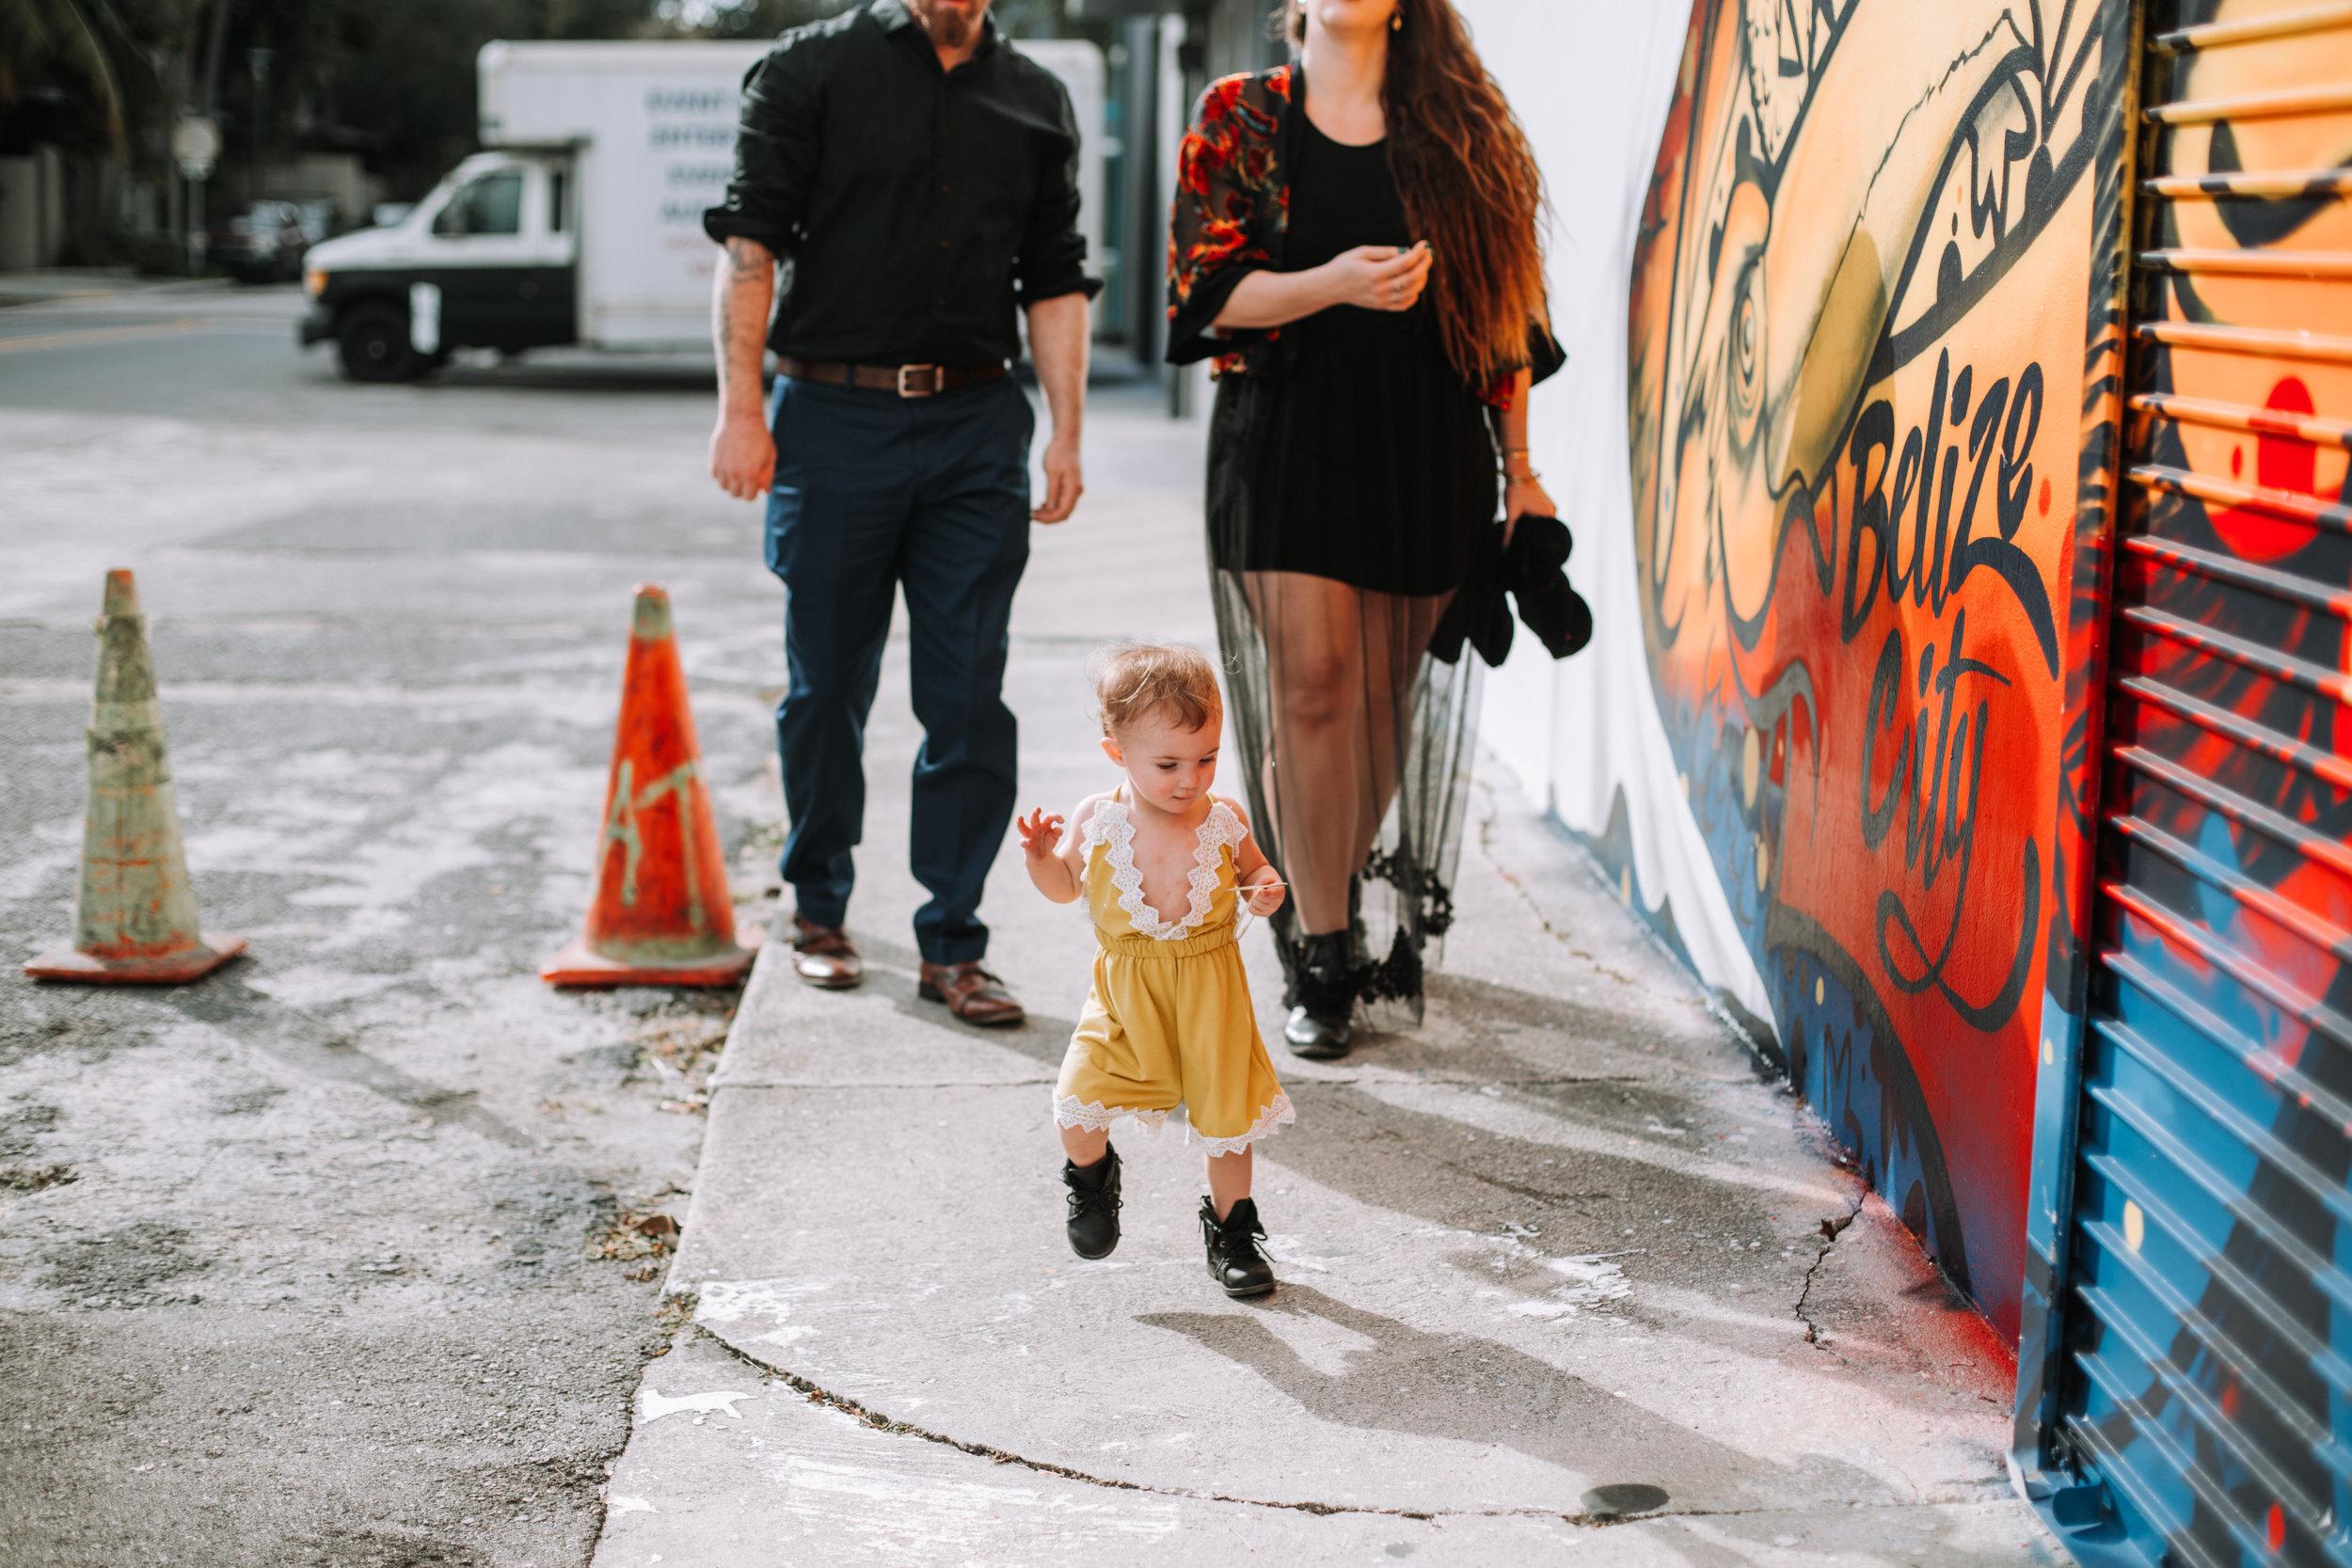 South-Florida-Family-photographer-RKMphotography-89.jpg